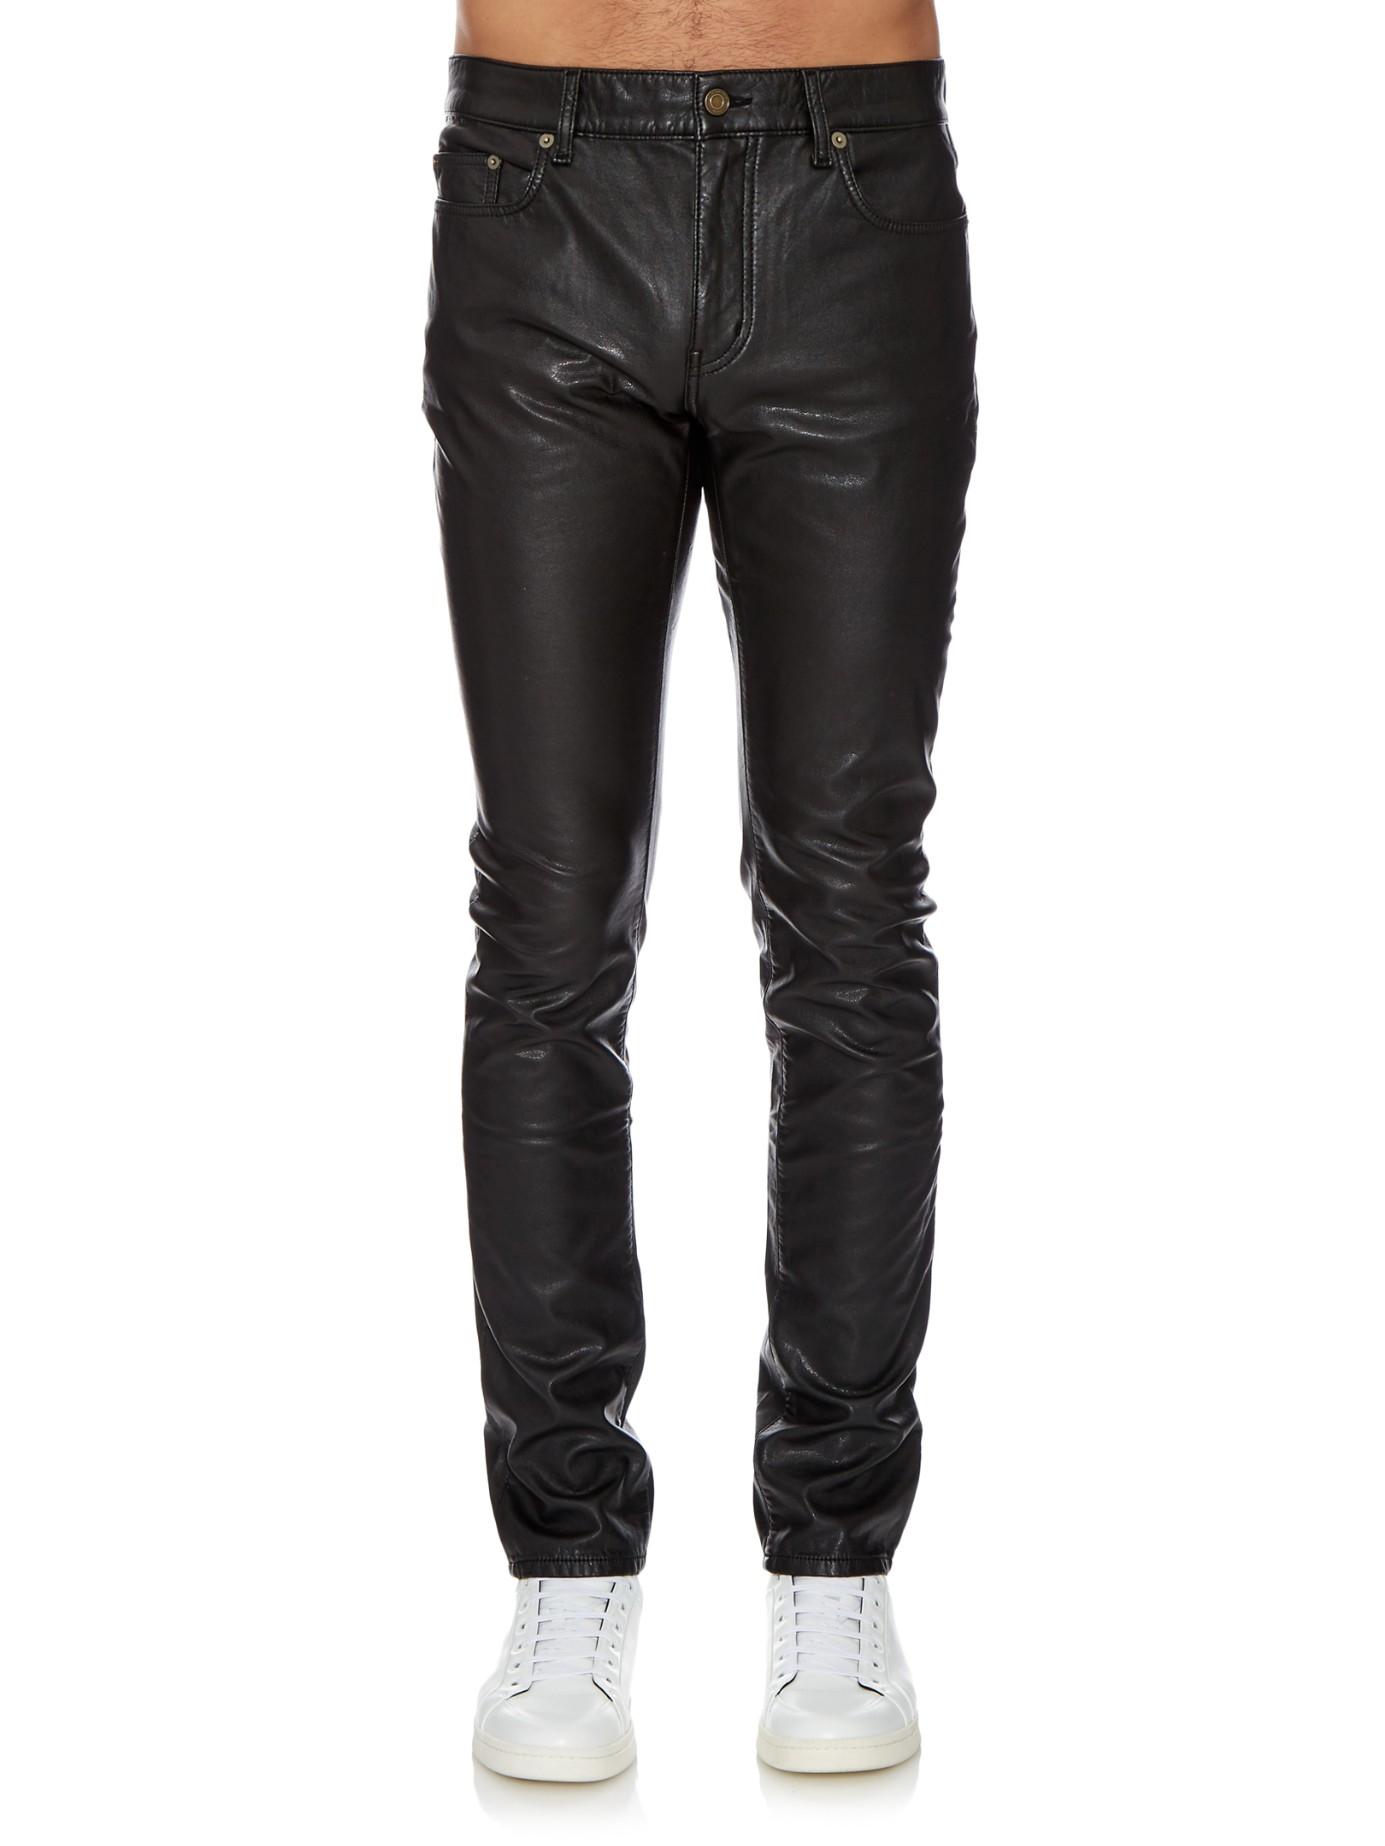 slim fit leather trousers - Black Saint Laurent iZBSVhmQu